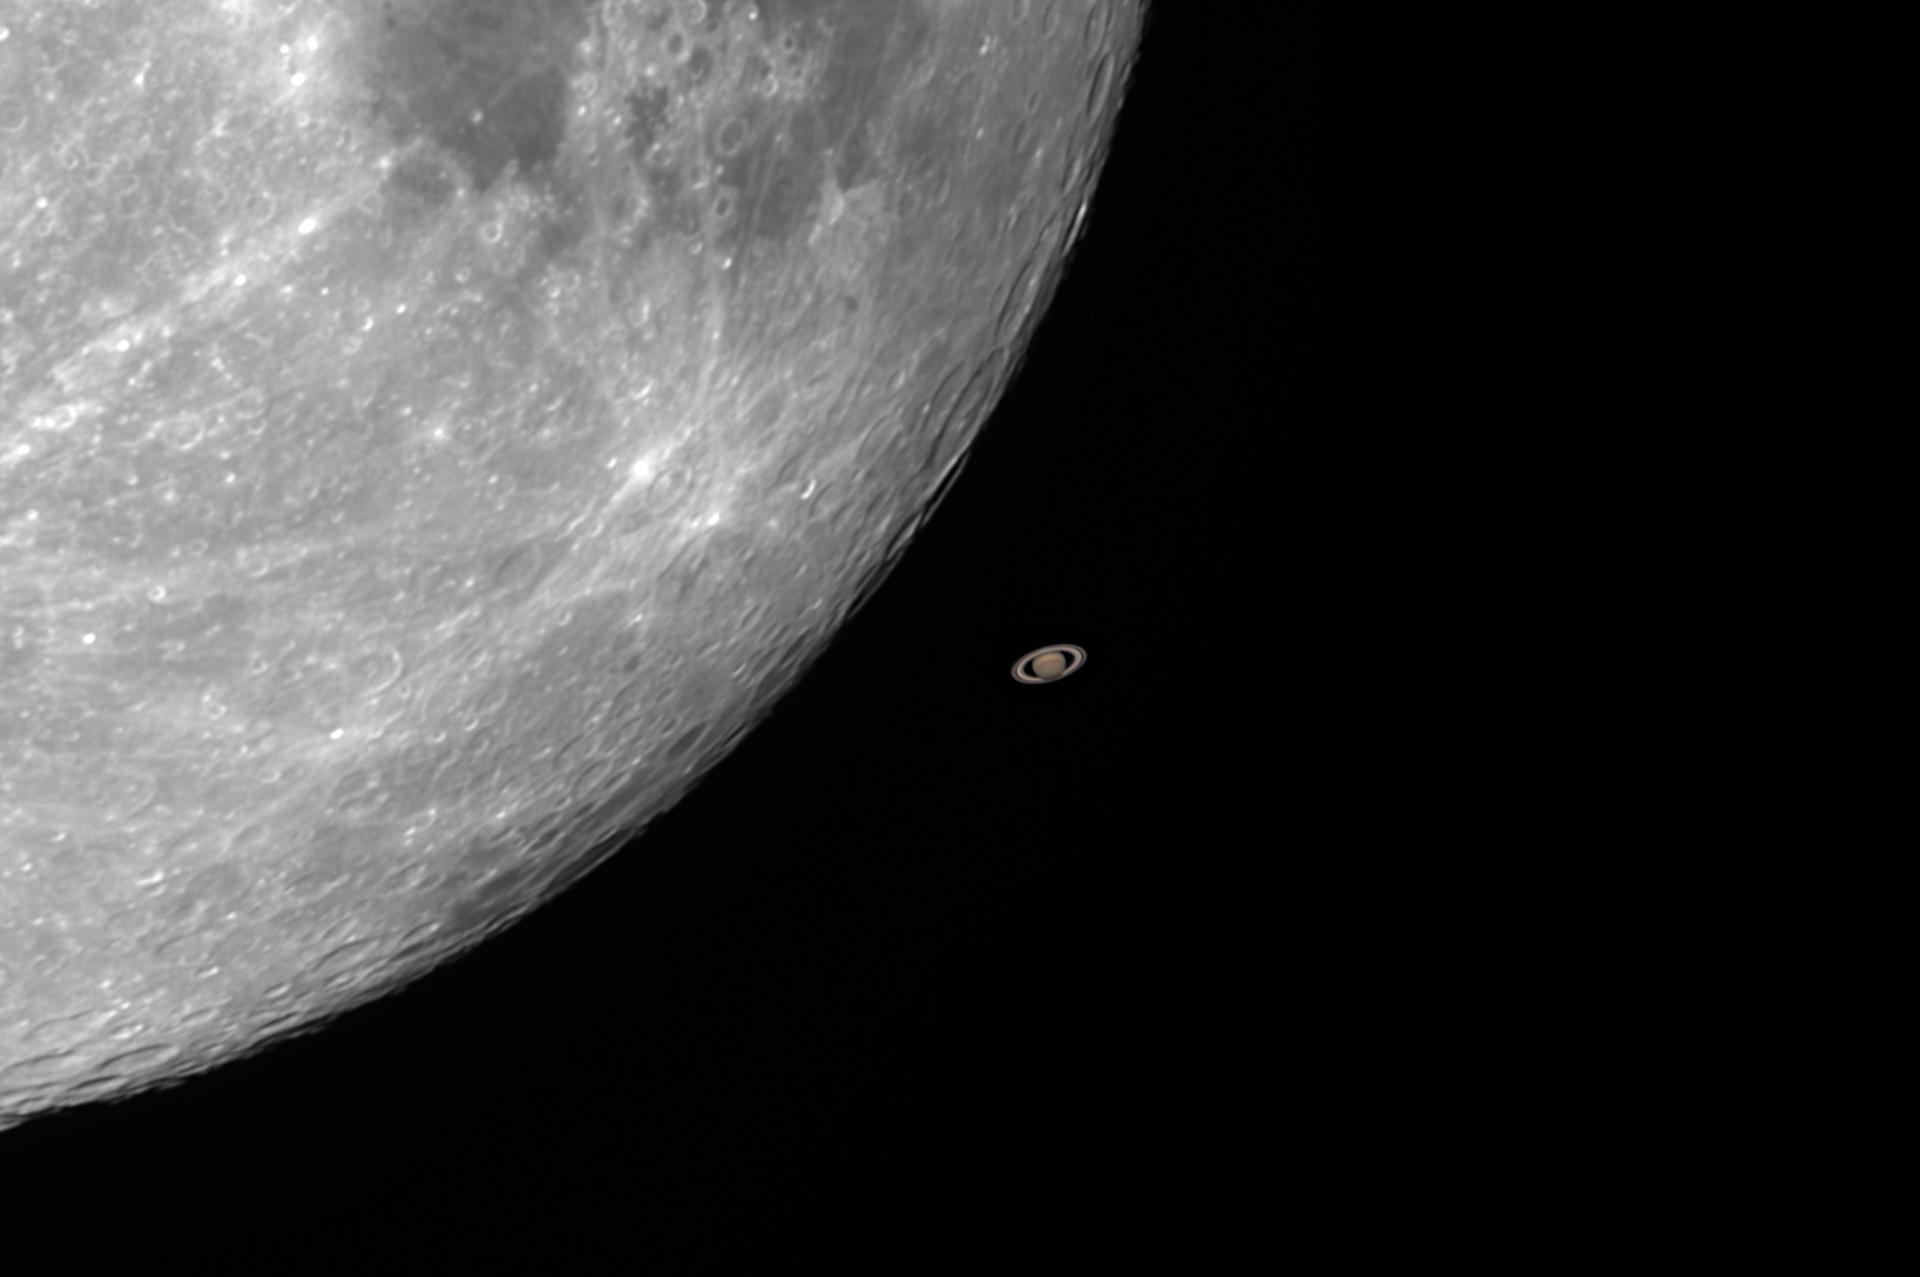 5e7ce34607c10_Saturne-Lune11-12-19732020.jpg.5ef630007c03e69d9321afaaa3276639.jpg